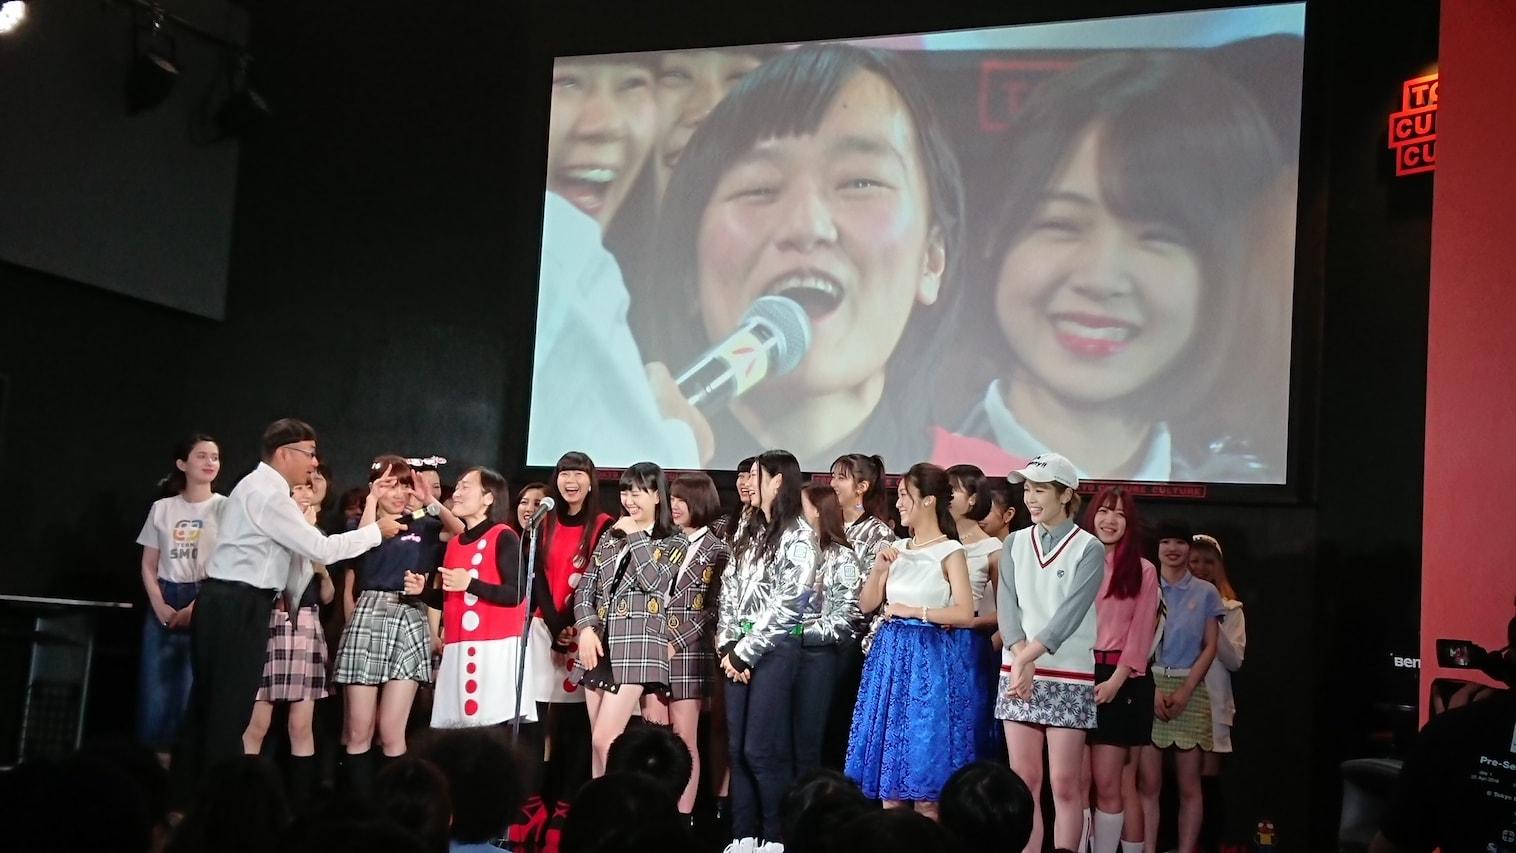 6/24 eQリーグ プレシーズンマッチDay3レポート(後編)